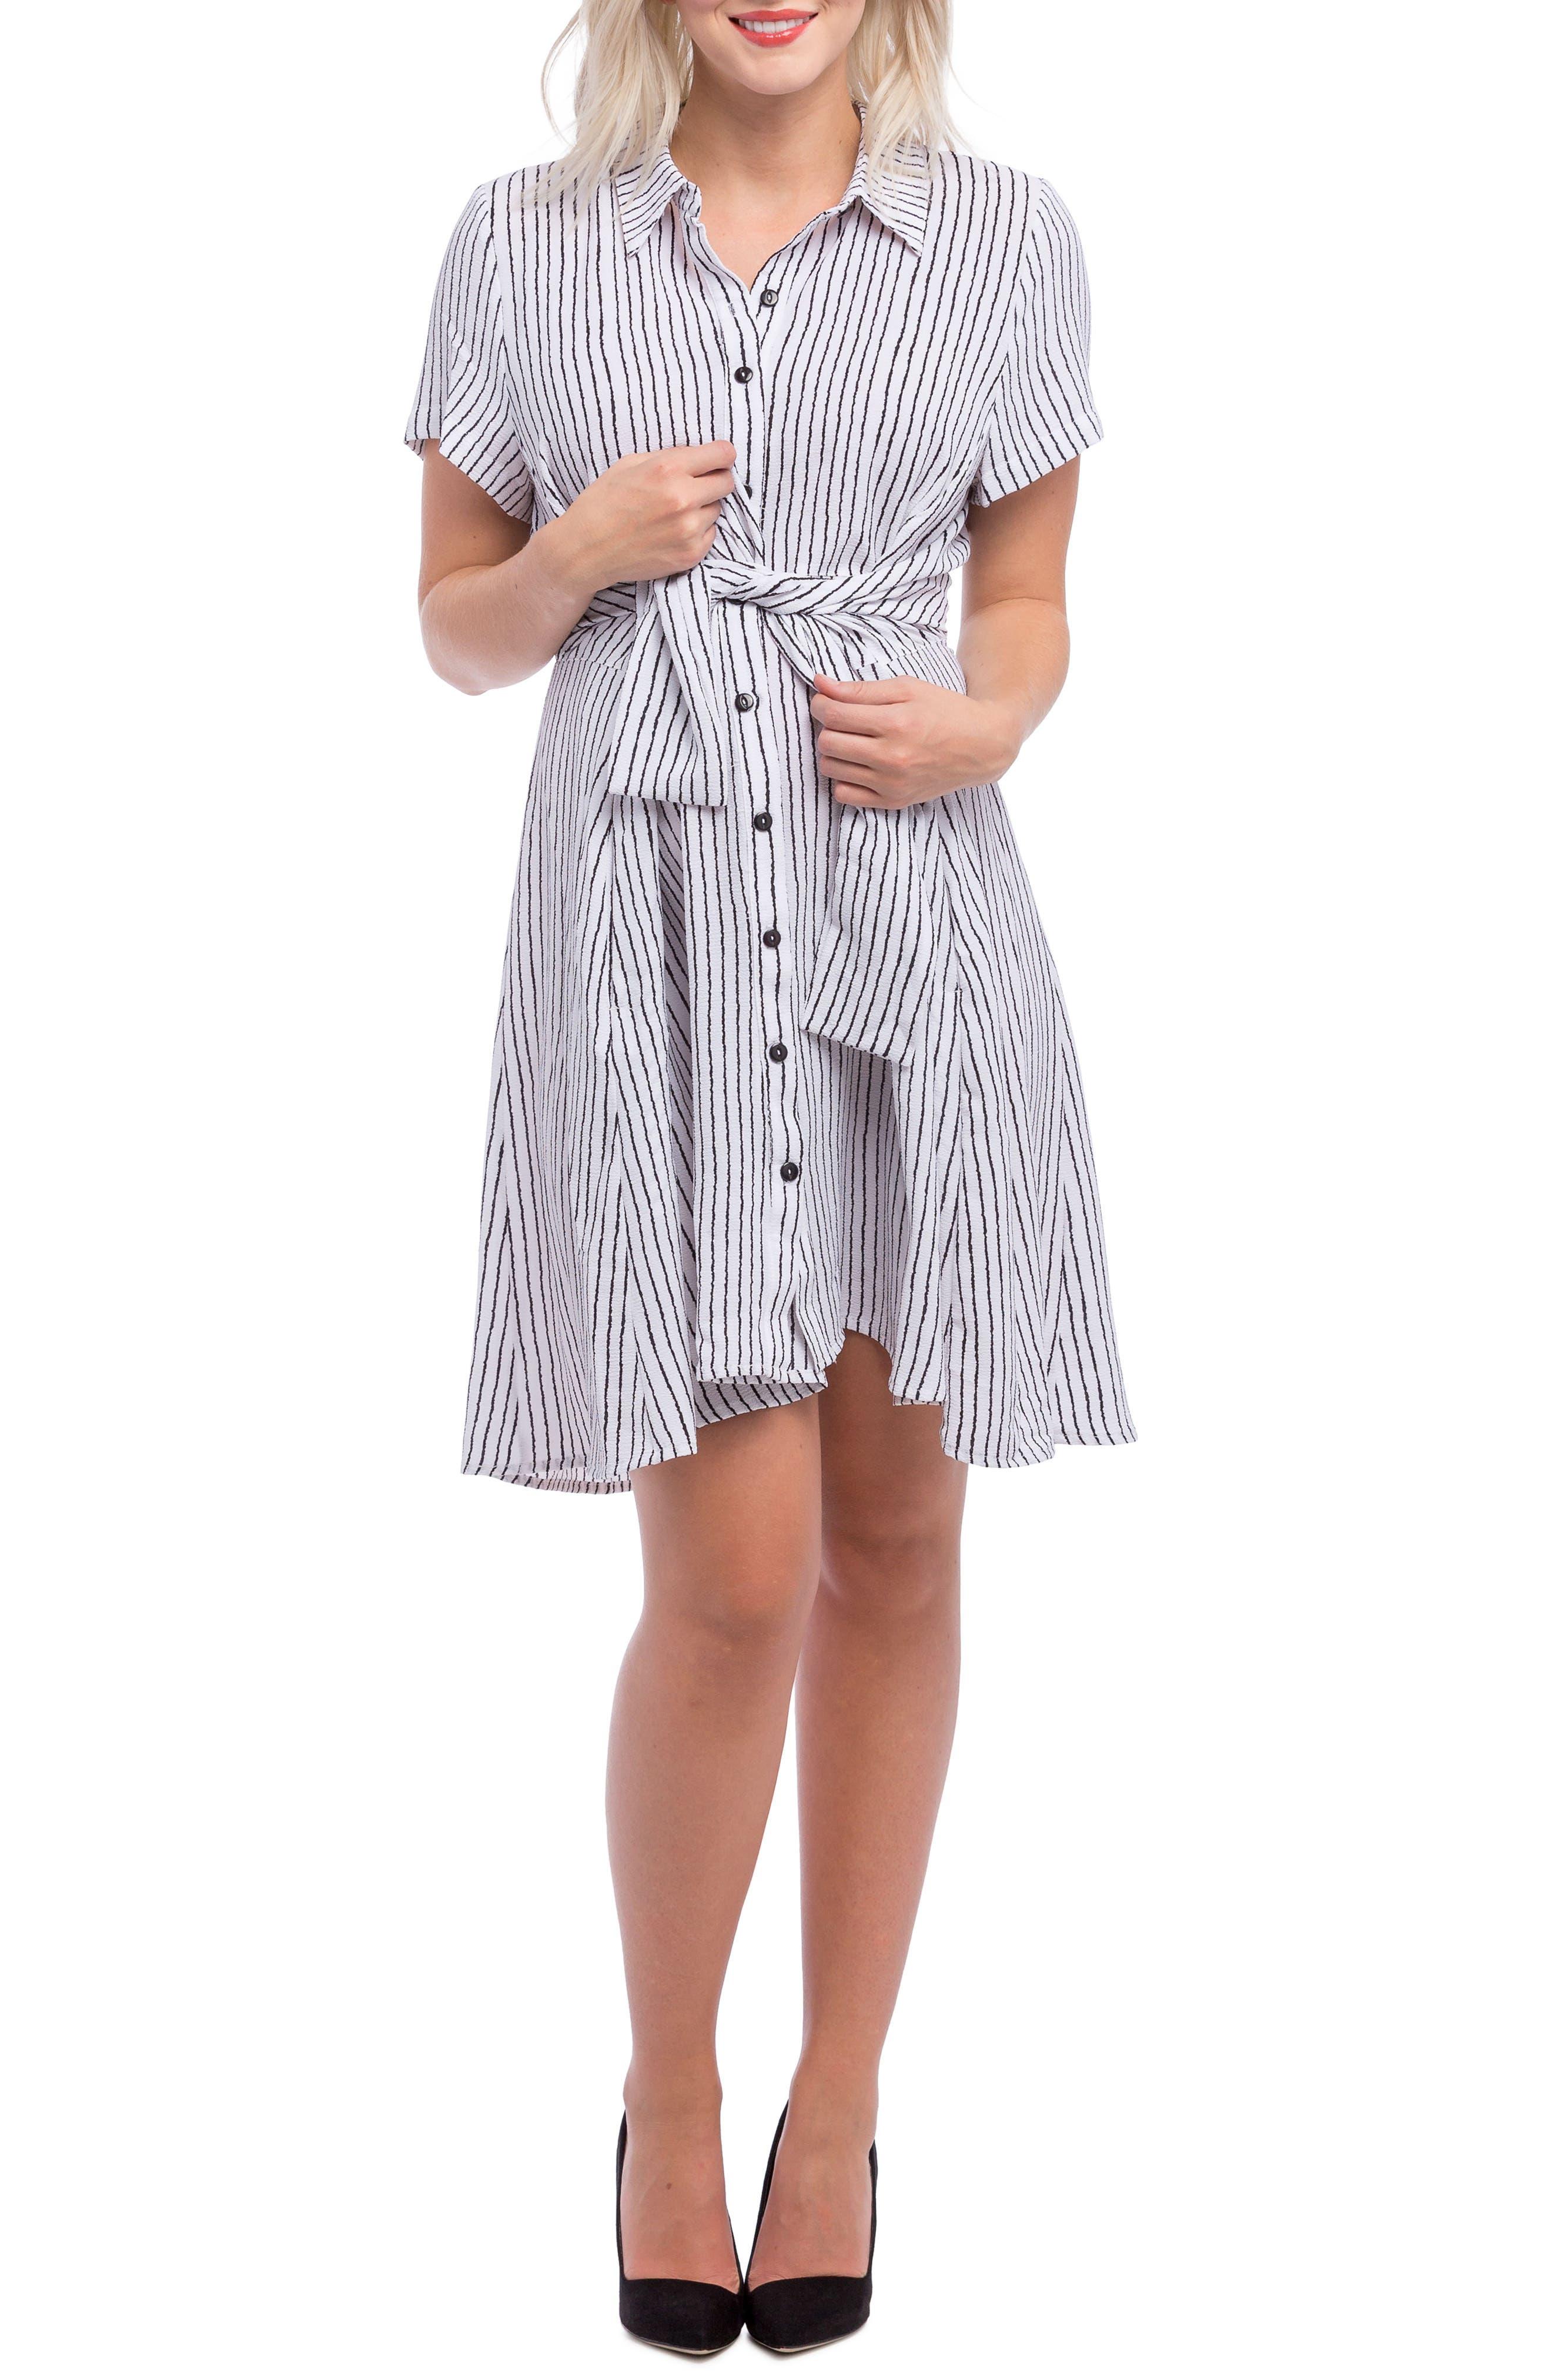 Lilac Clothing Stripe Maternity Shirt Dress